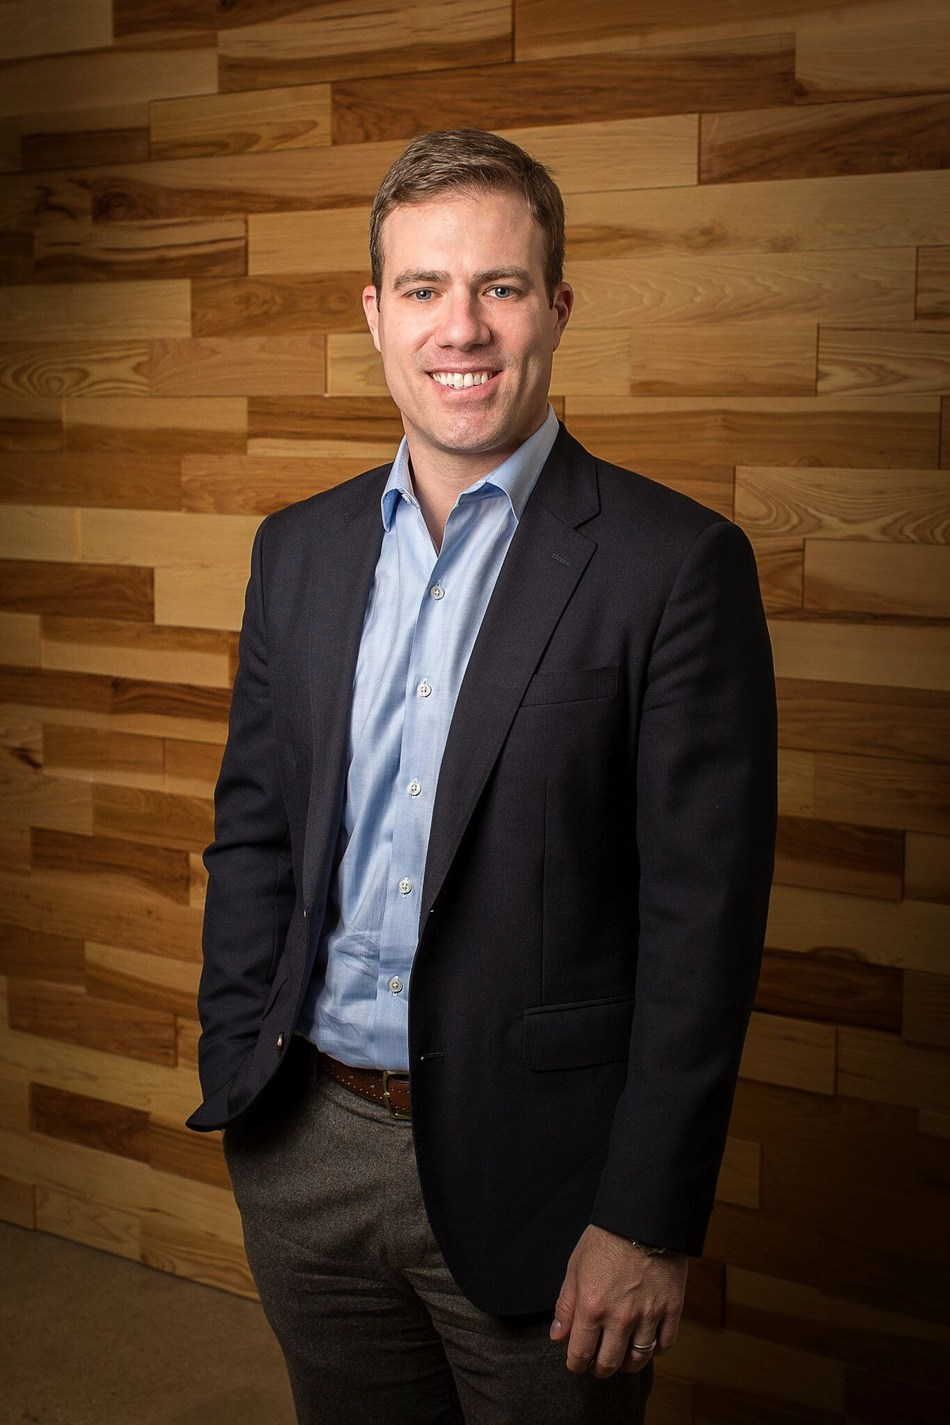 Brad Wilson, Chief Marketing Officer at LendingTree